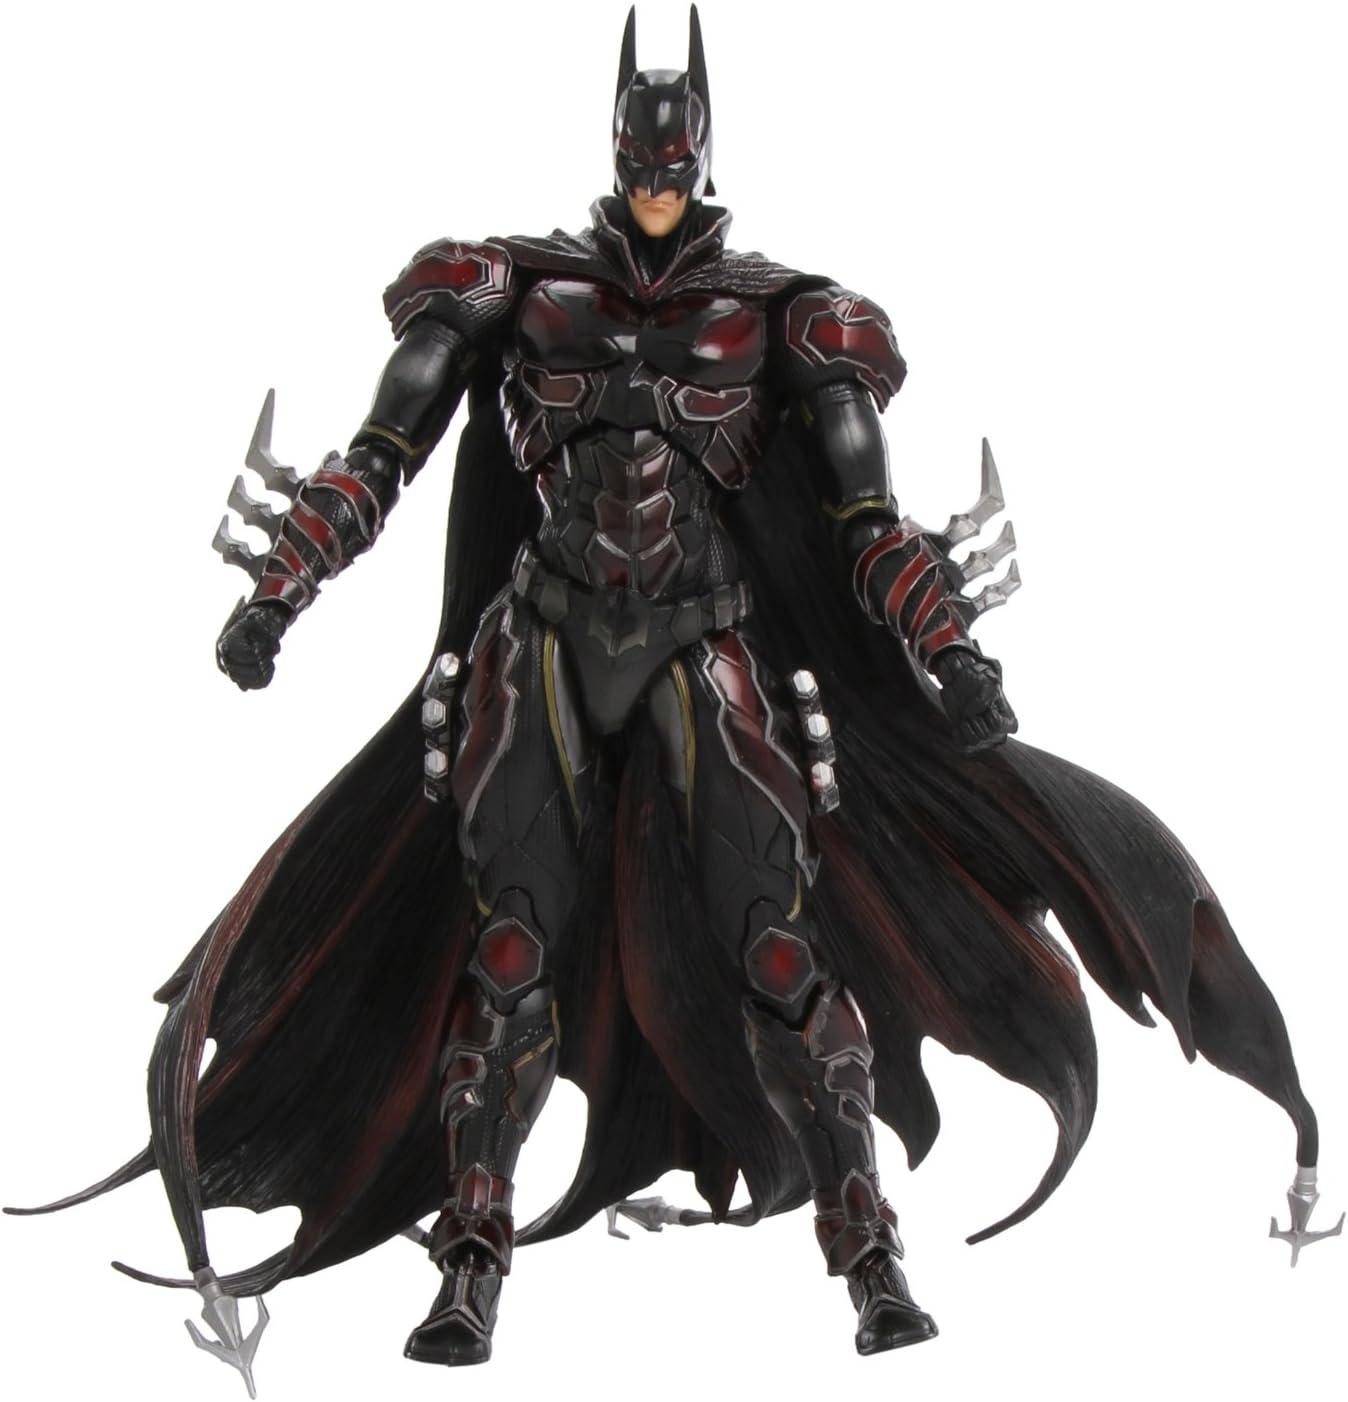 Square Enix DC Comics Variant Play Arts Kai Batman Red Costume Action Figure